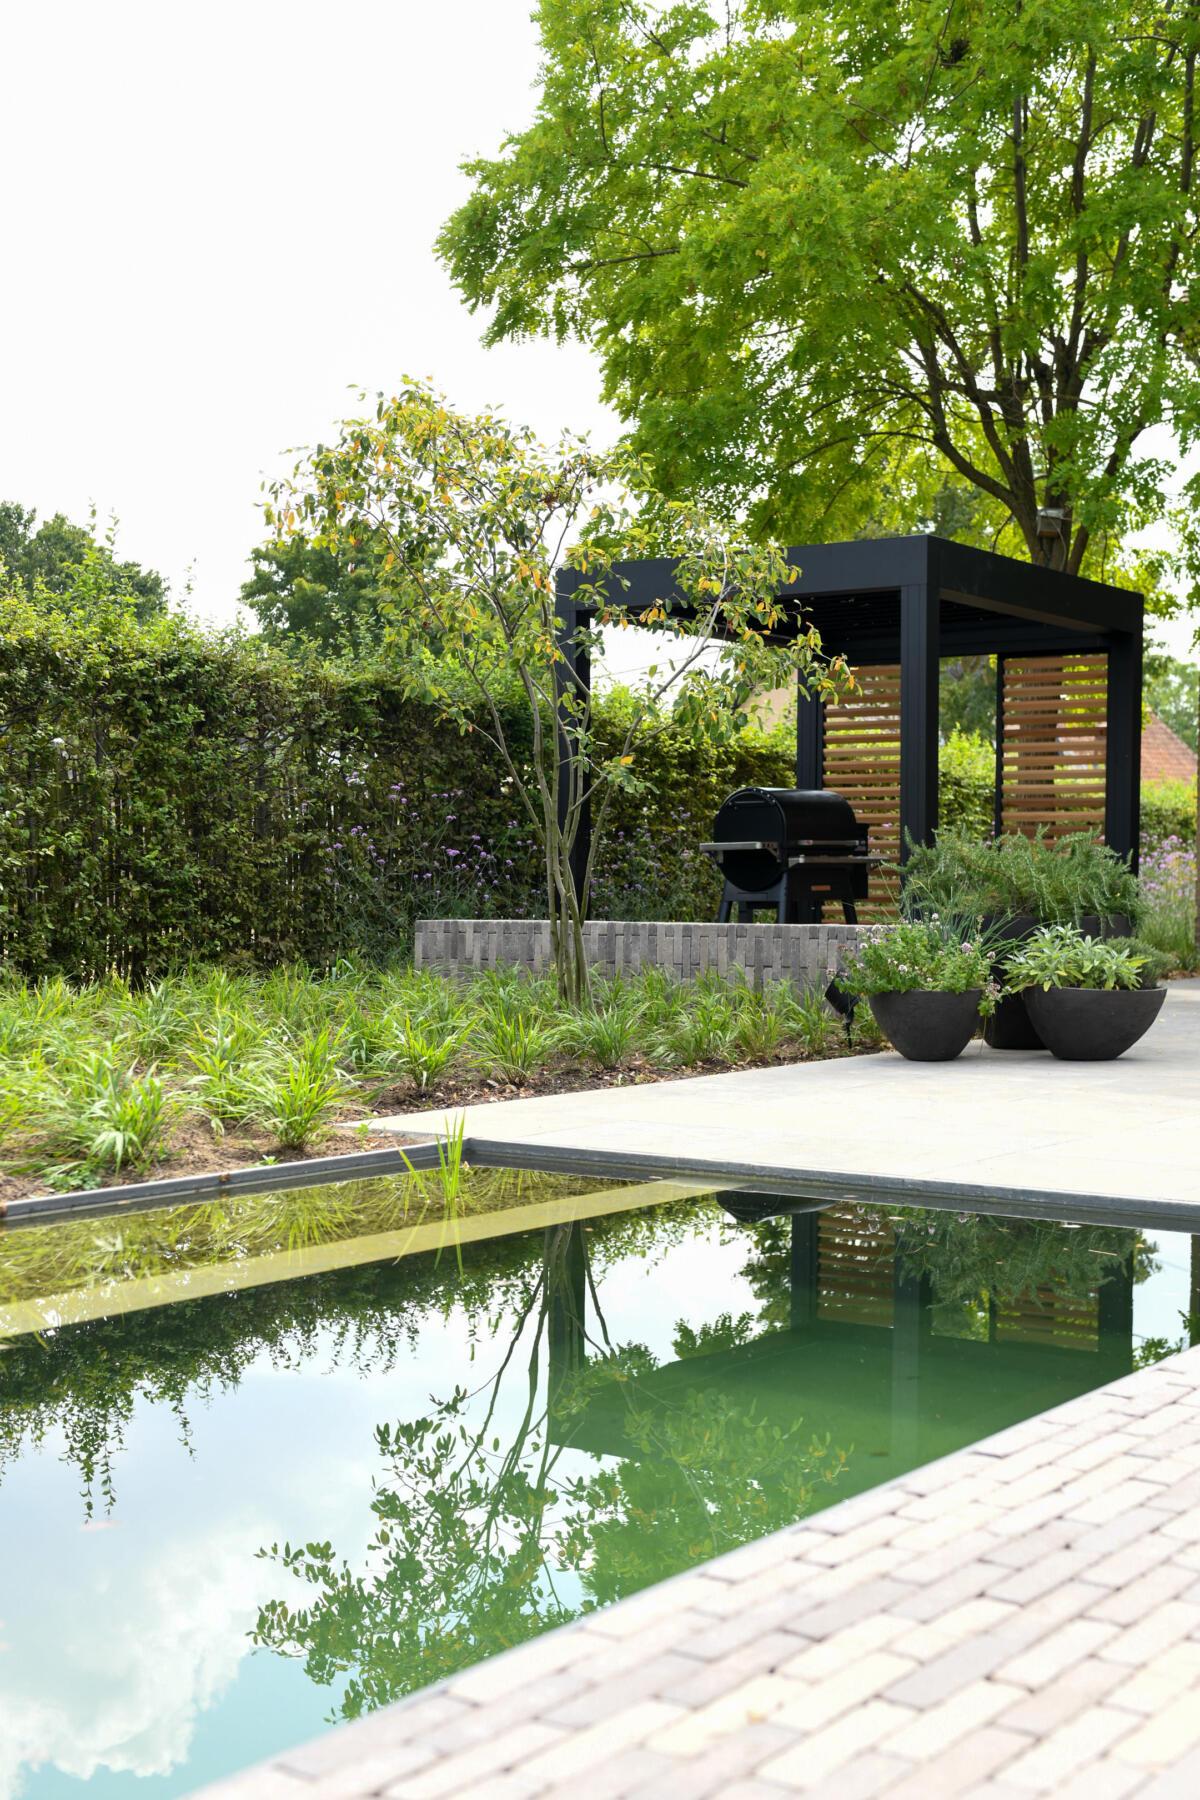 Bloemrijke tuin - Parike